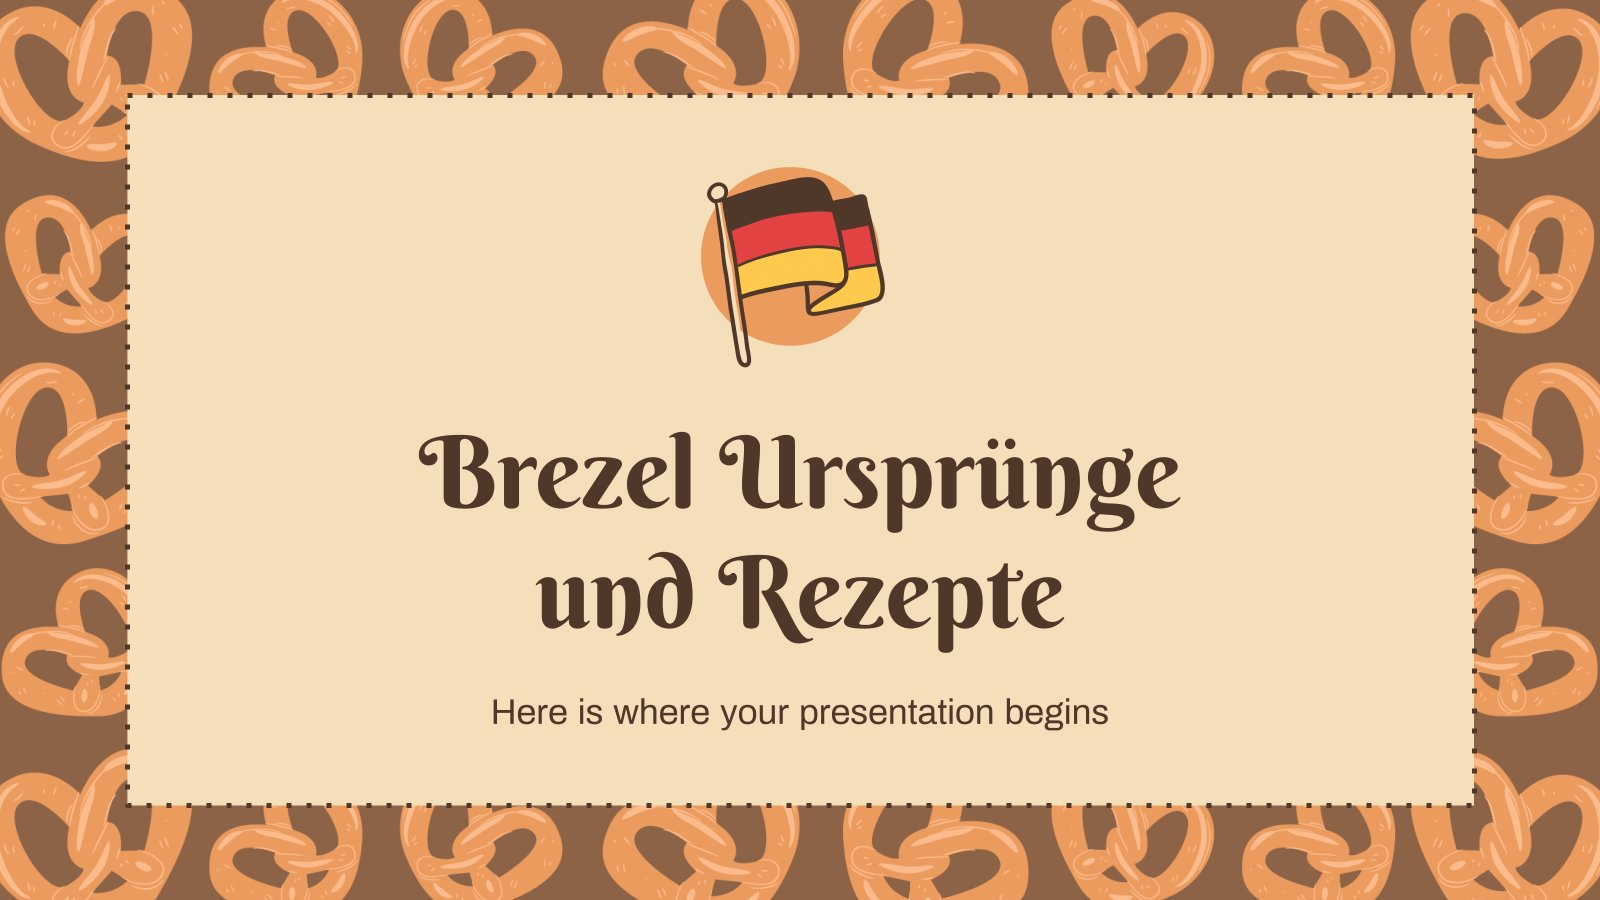 Modelo de apresentação Brezel Ursprünge und Rezepte